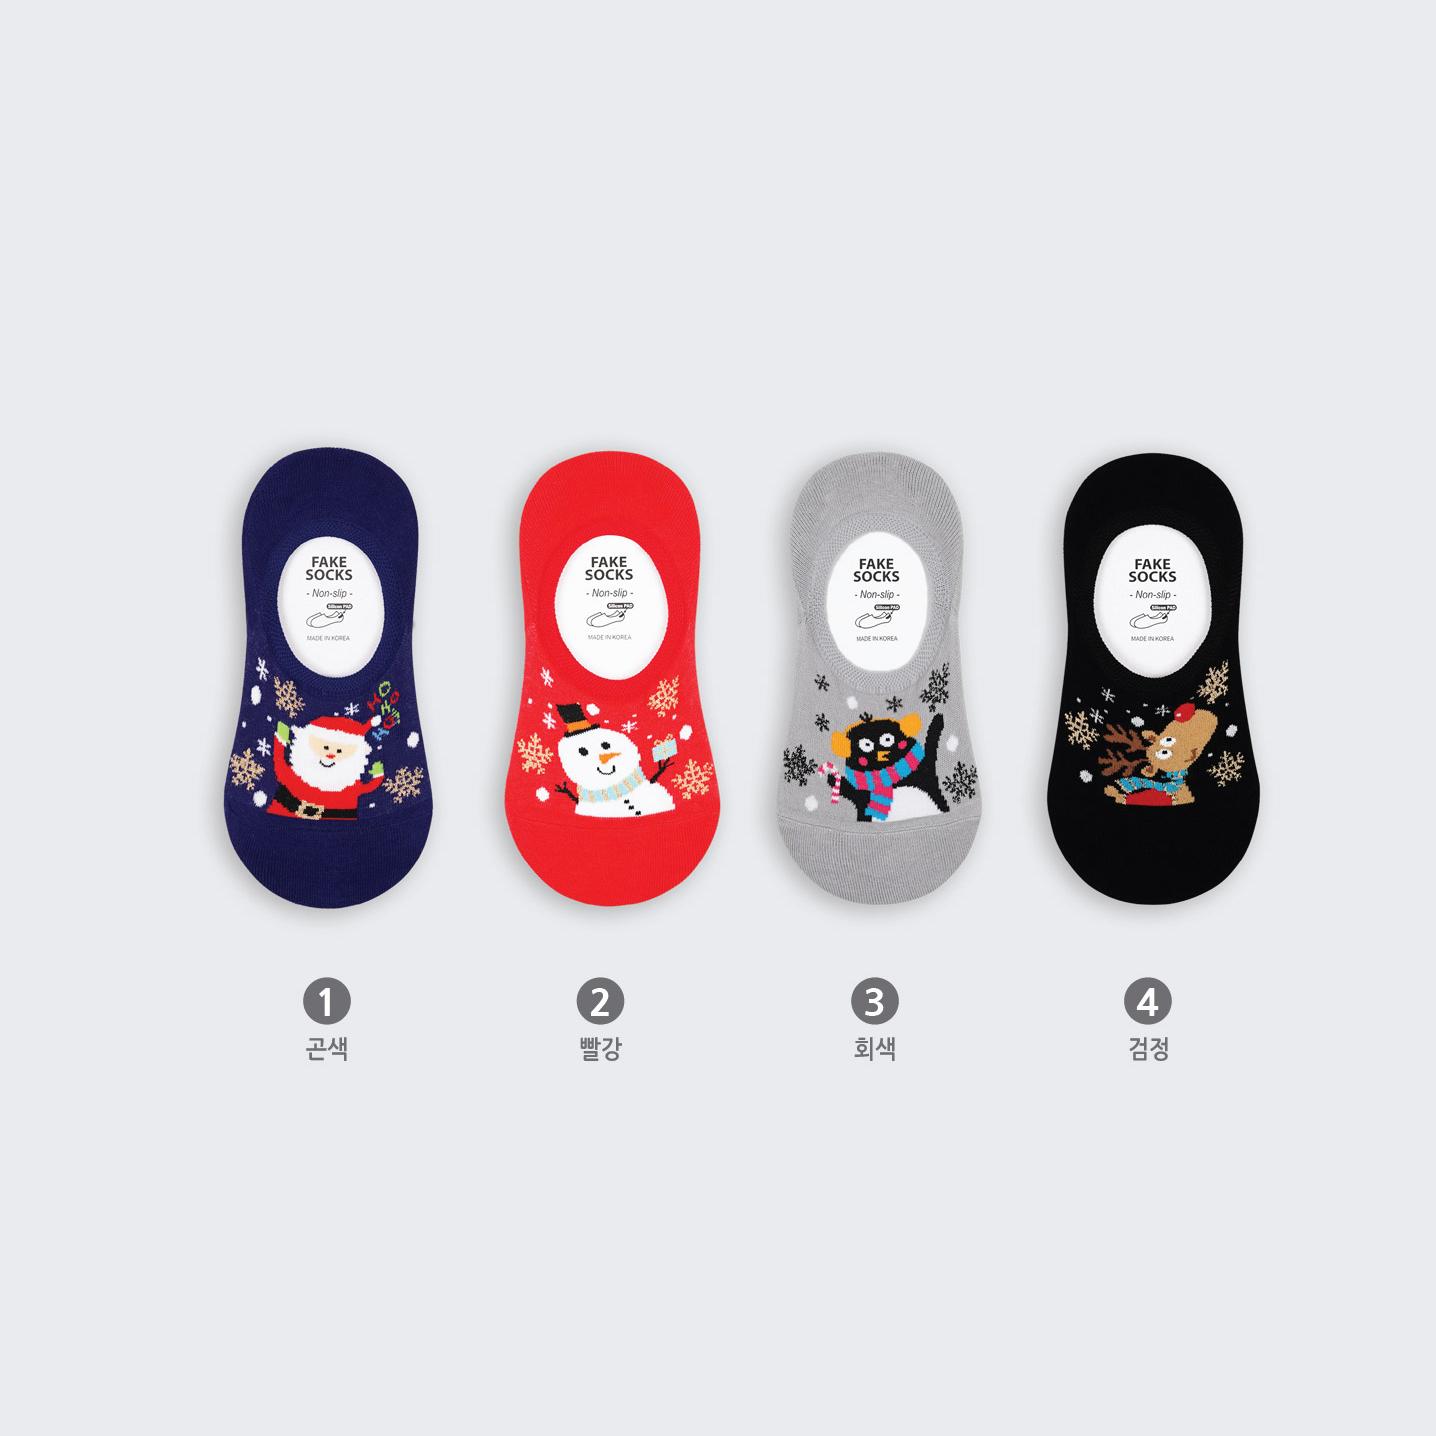 GY韩袜 韩国袜子 秋新年红色女棉袜 卡通圣诞麋鹿雪人船袜 浅口袜